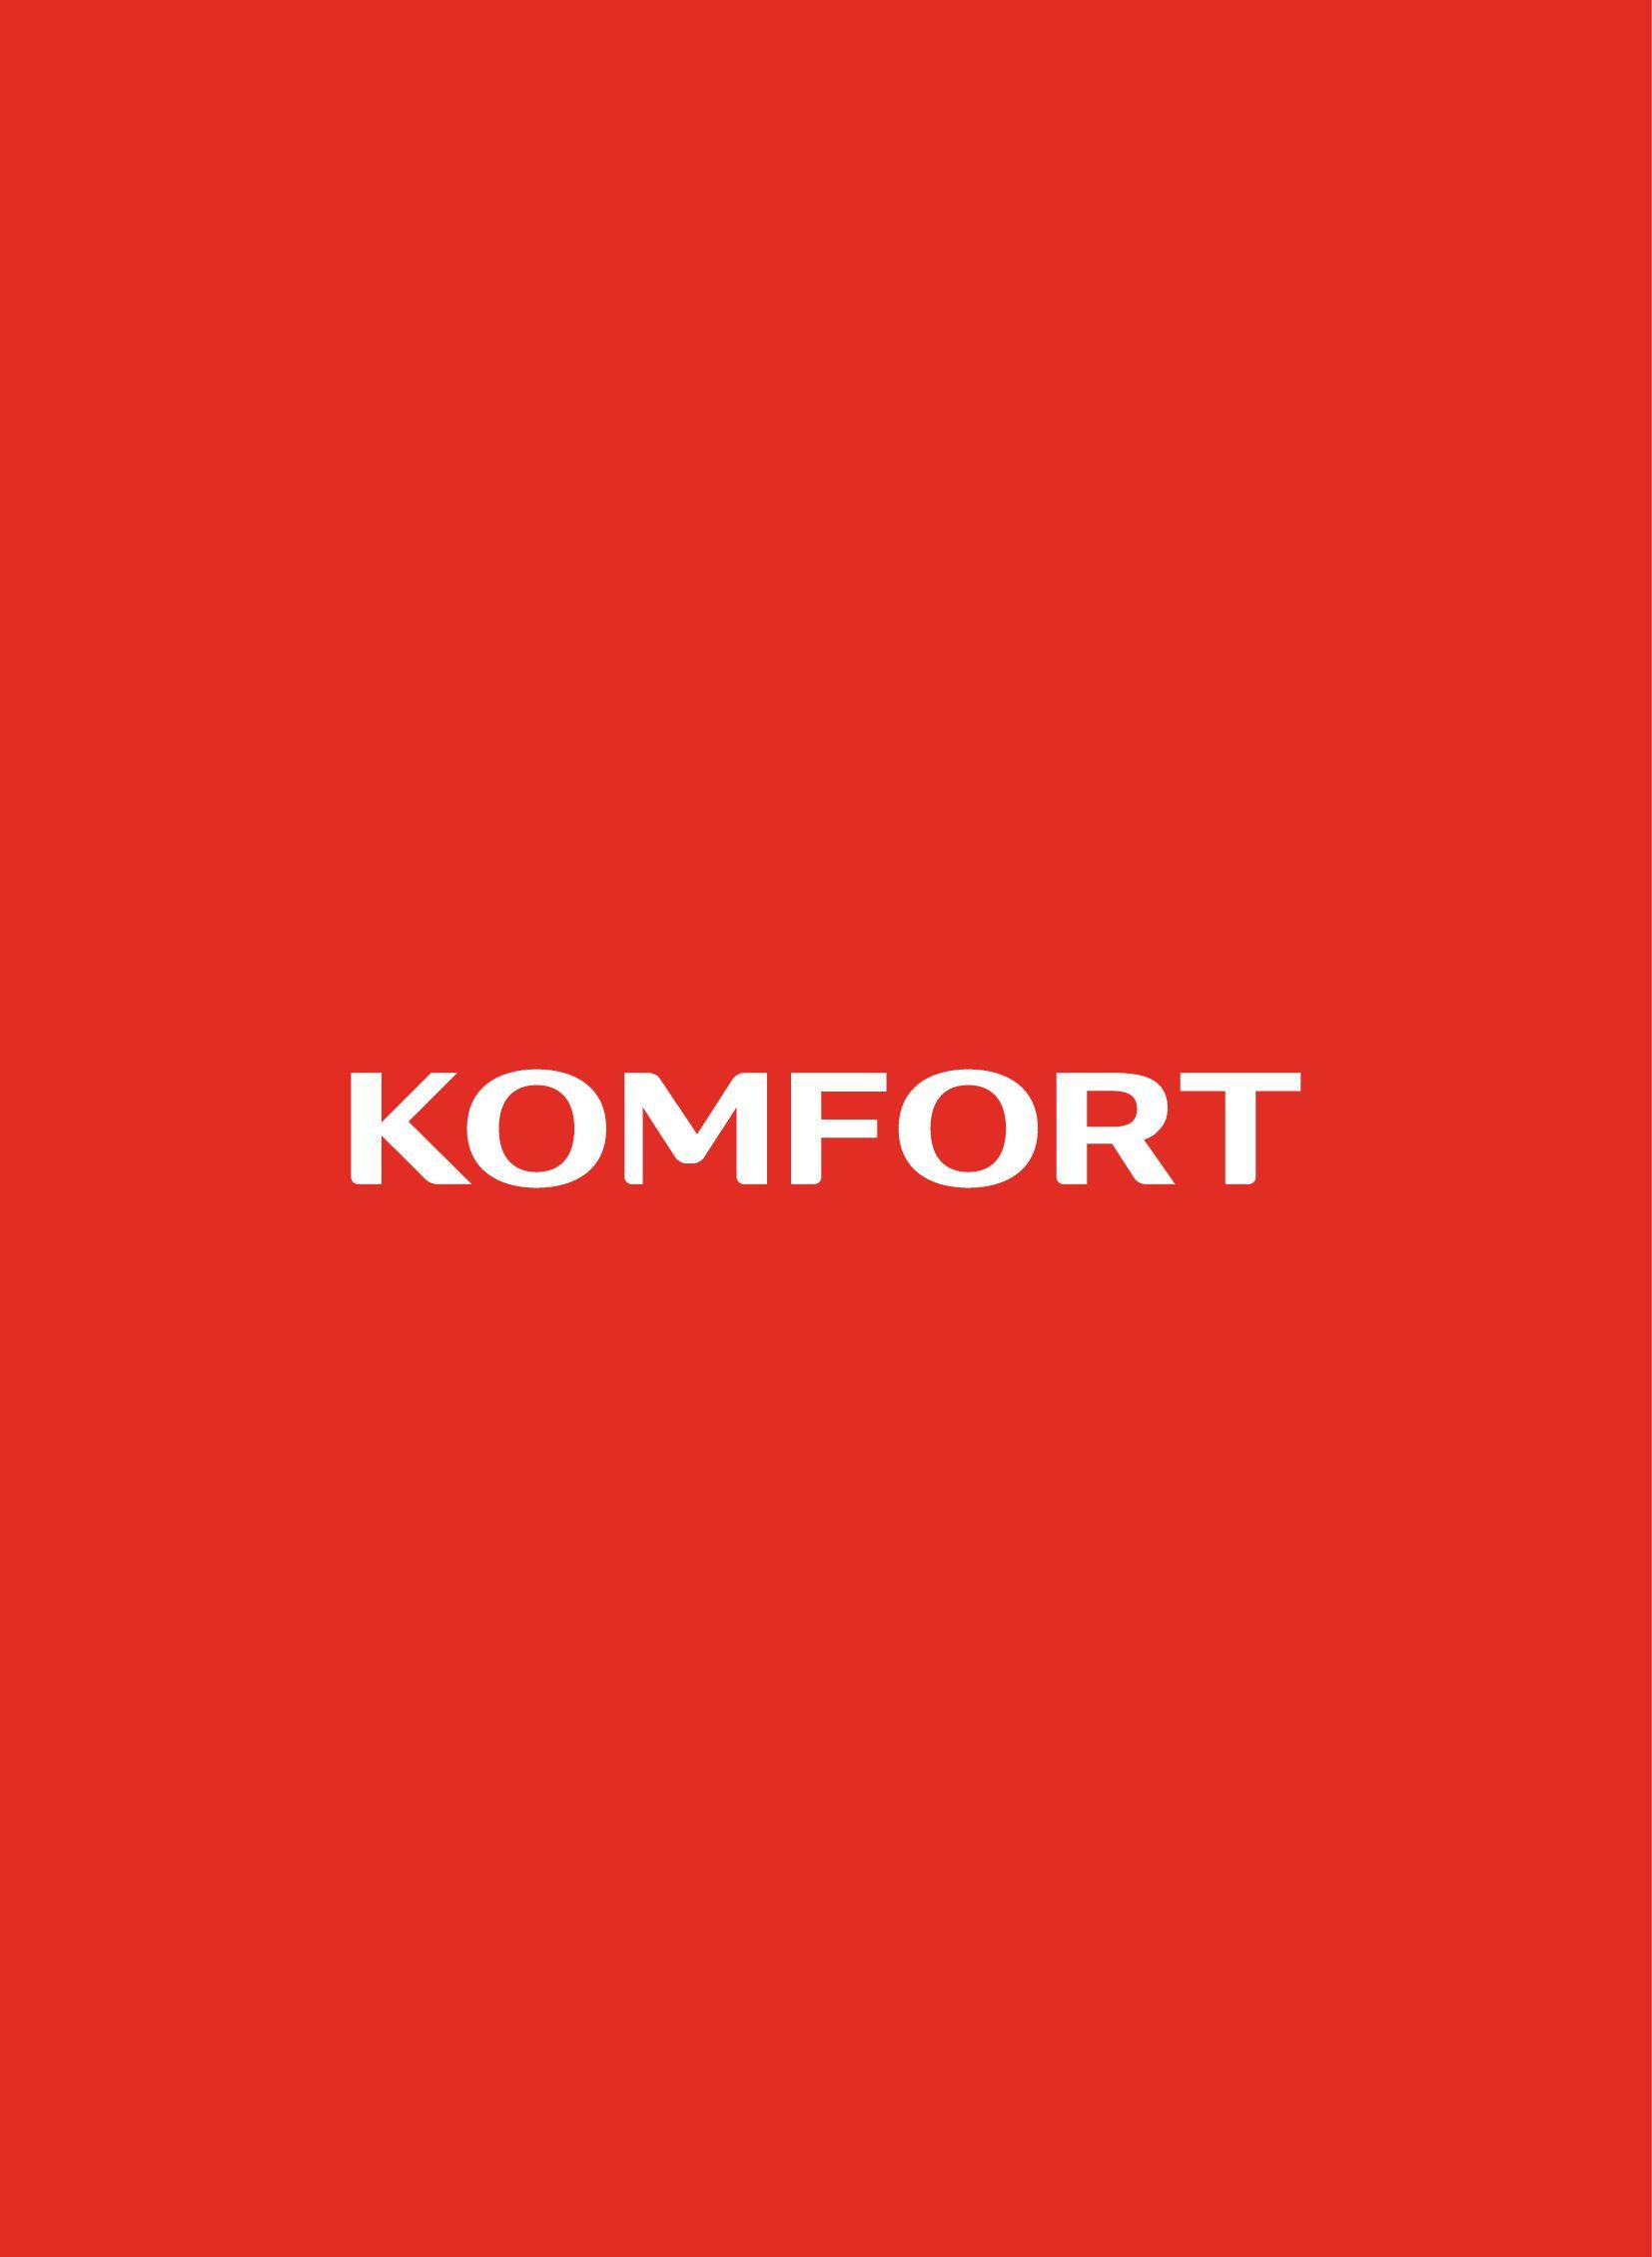 Gazetka Komfort: Gazetka Komfort - Katalog podłogi i drzwi 2021-06-16 page-76